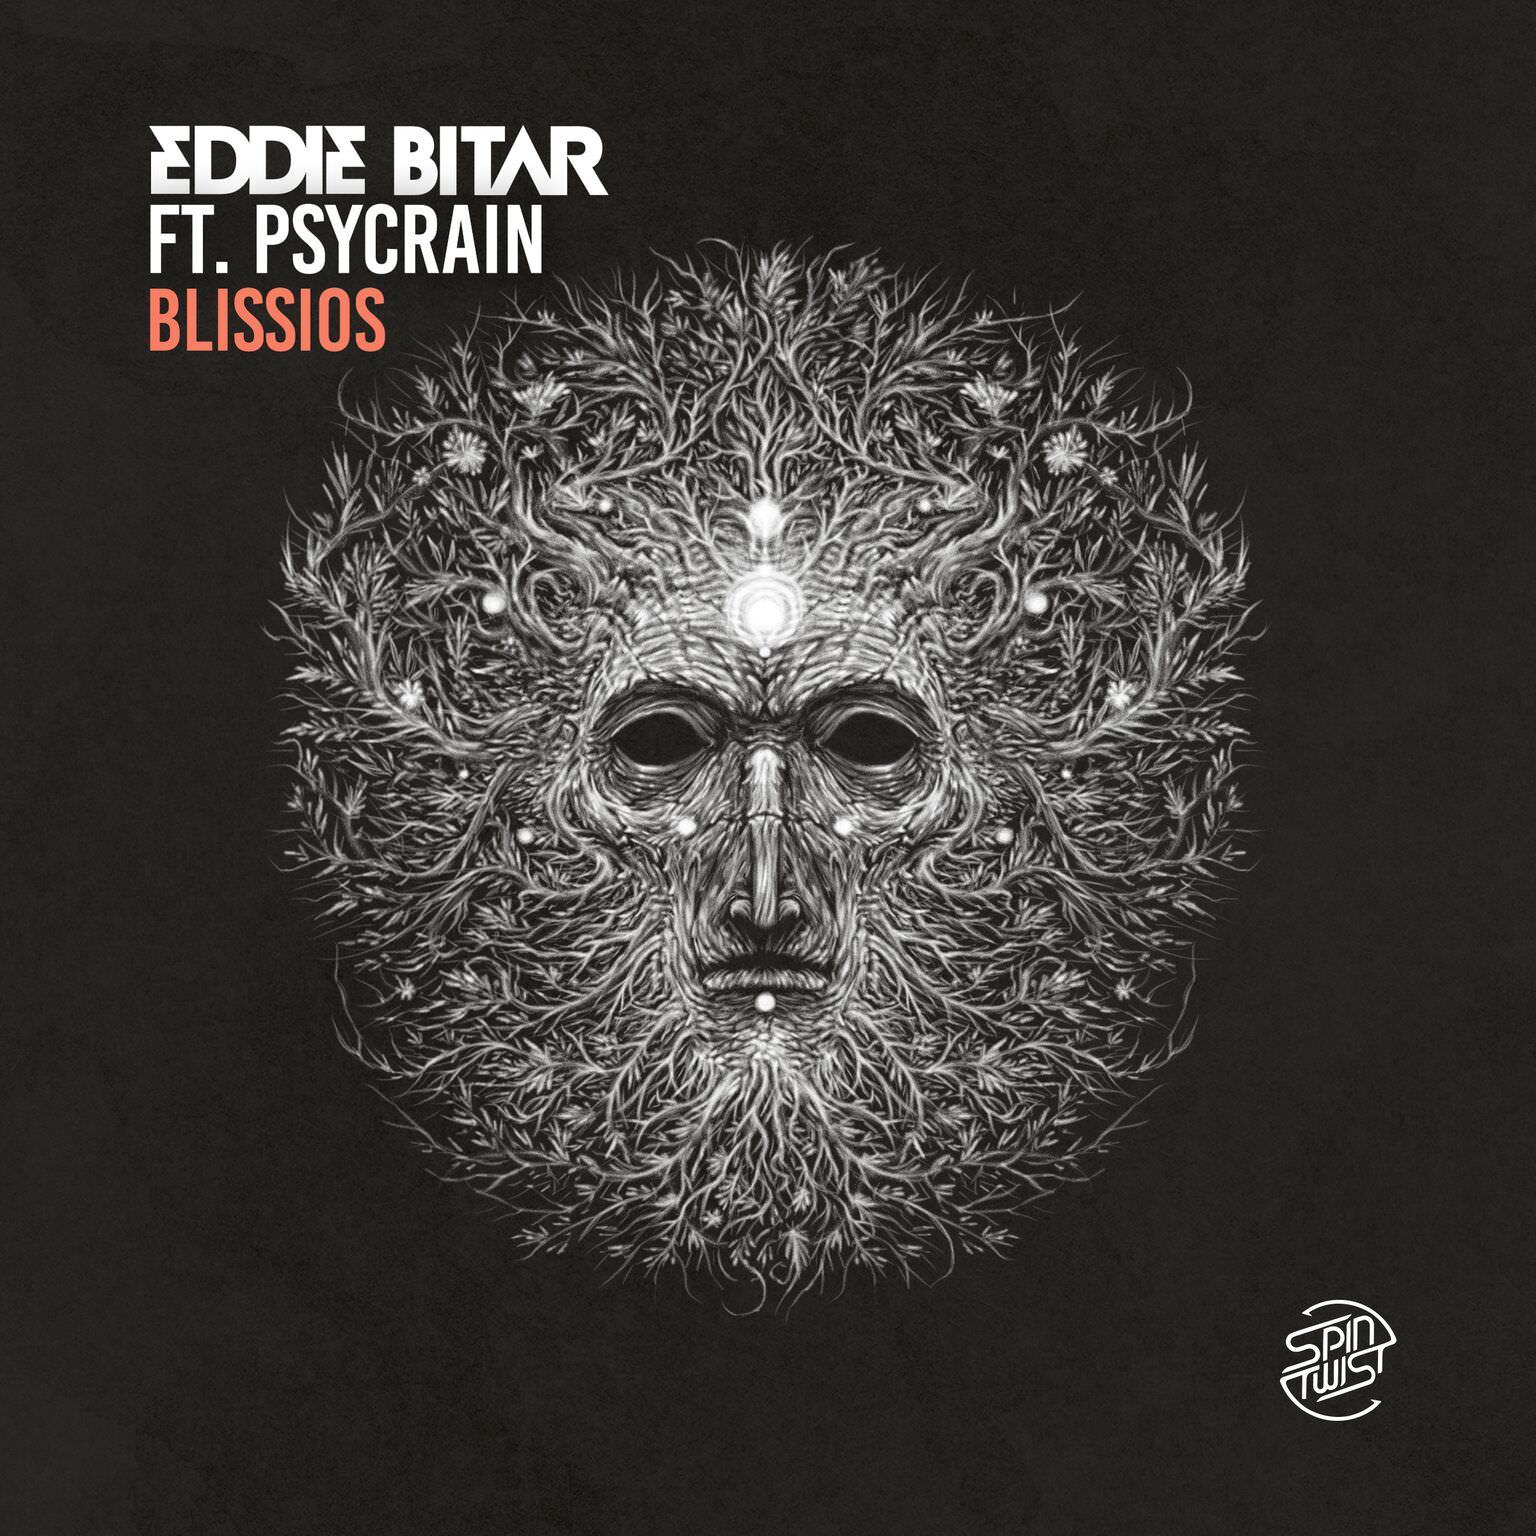 Eddie Bitar FT. Psycrain 'Blissios' Packshot_preview.jpeg